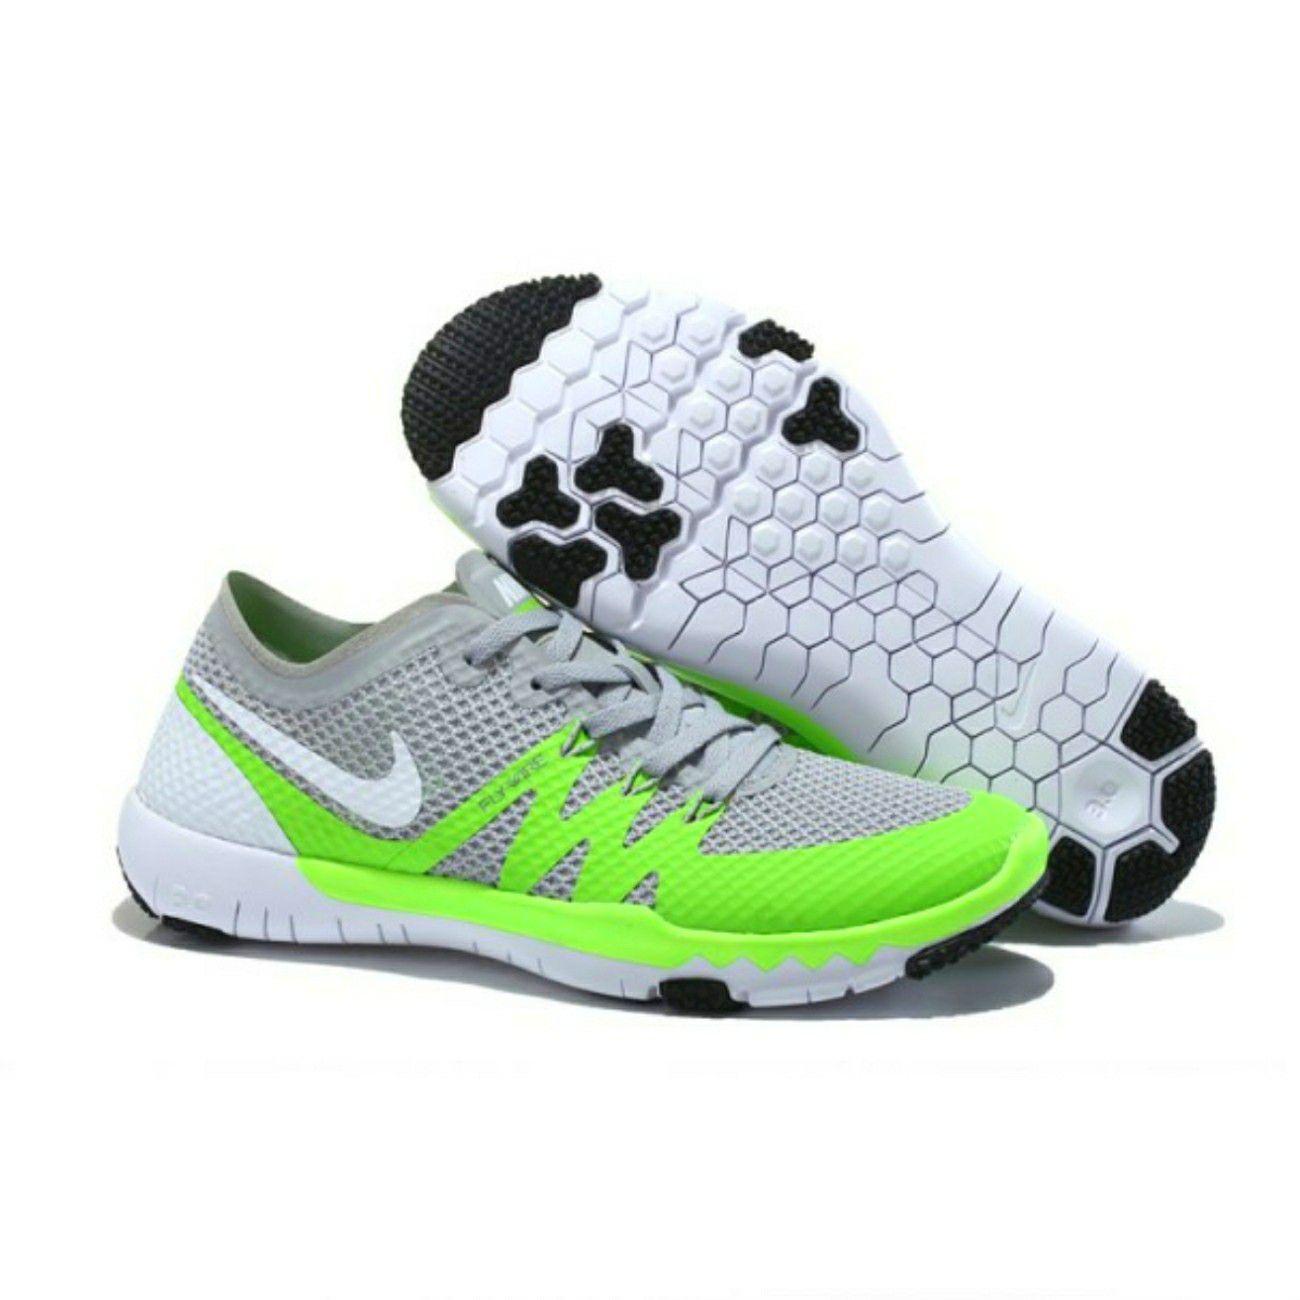 Nike Surplus Flywire Multi Color